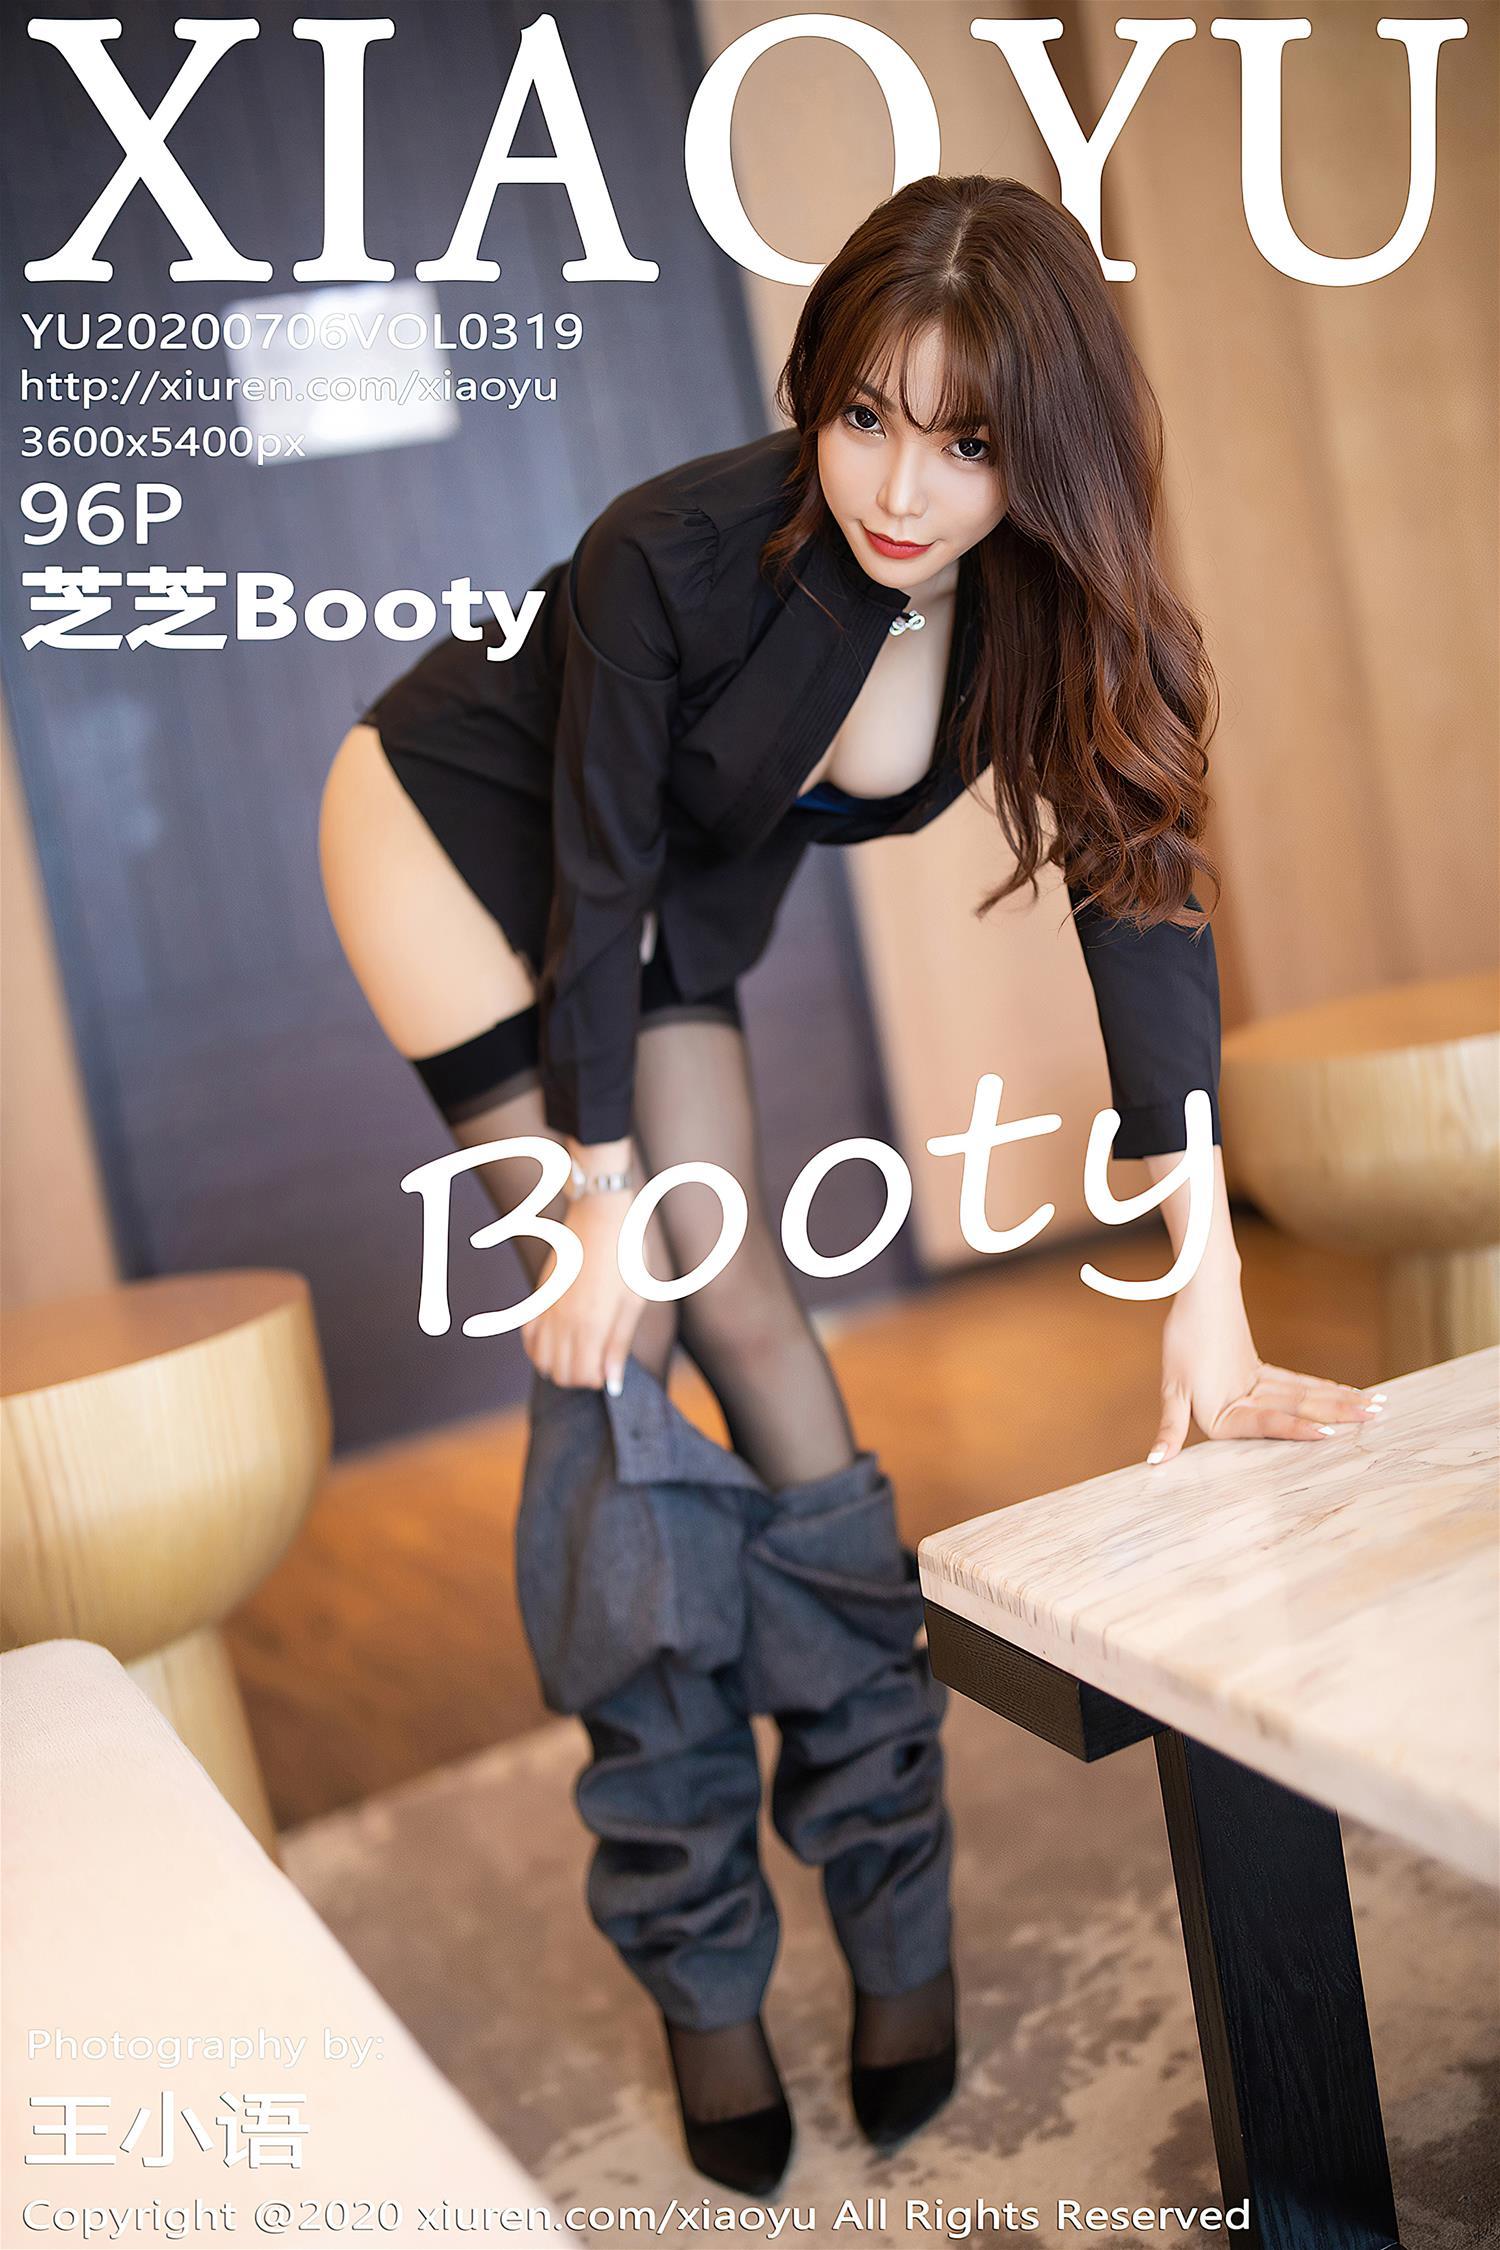 [XIAOYU语画界] 2020.07.06 VOL.319 芝芝Booty [97P]